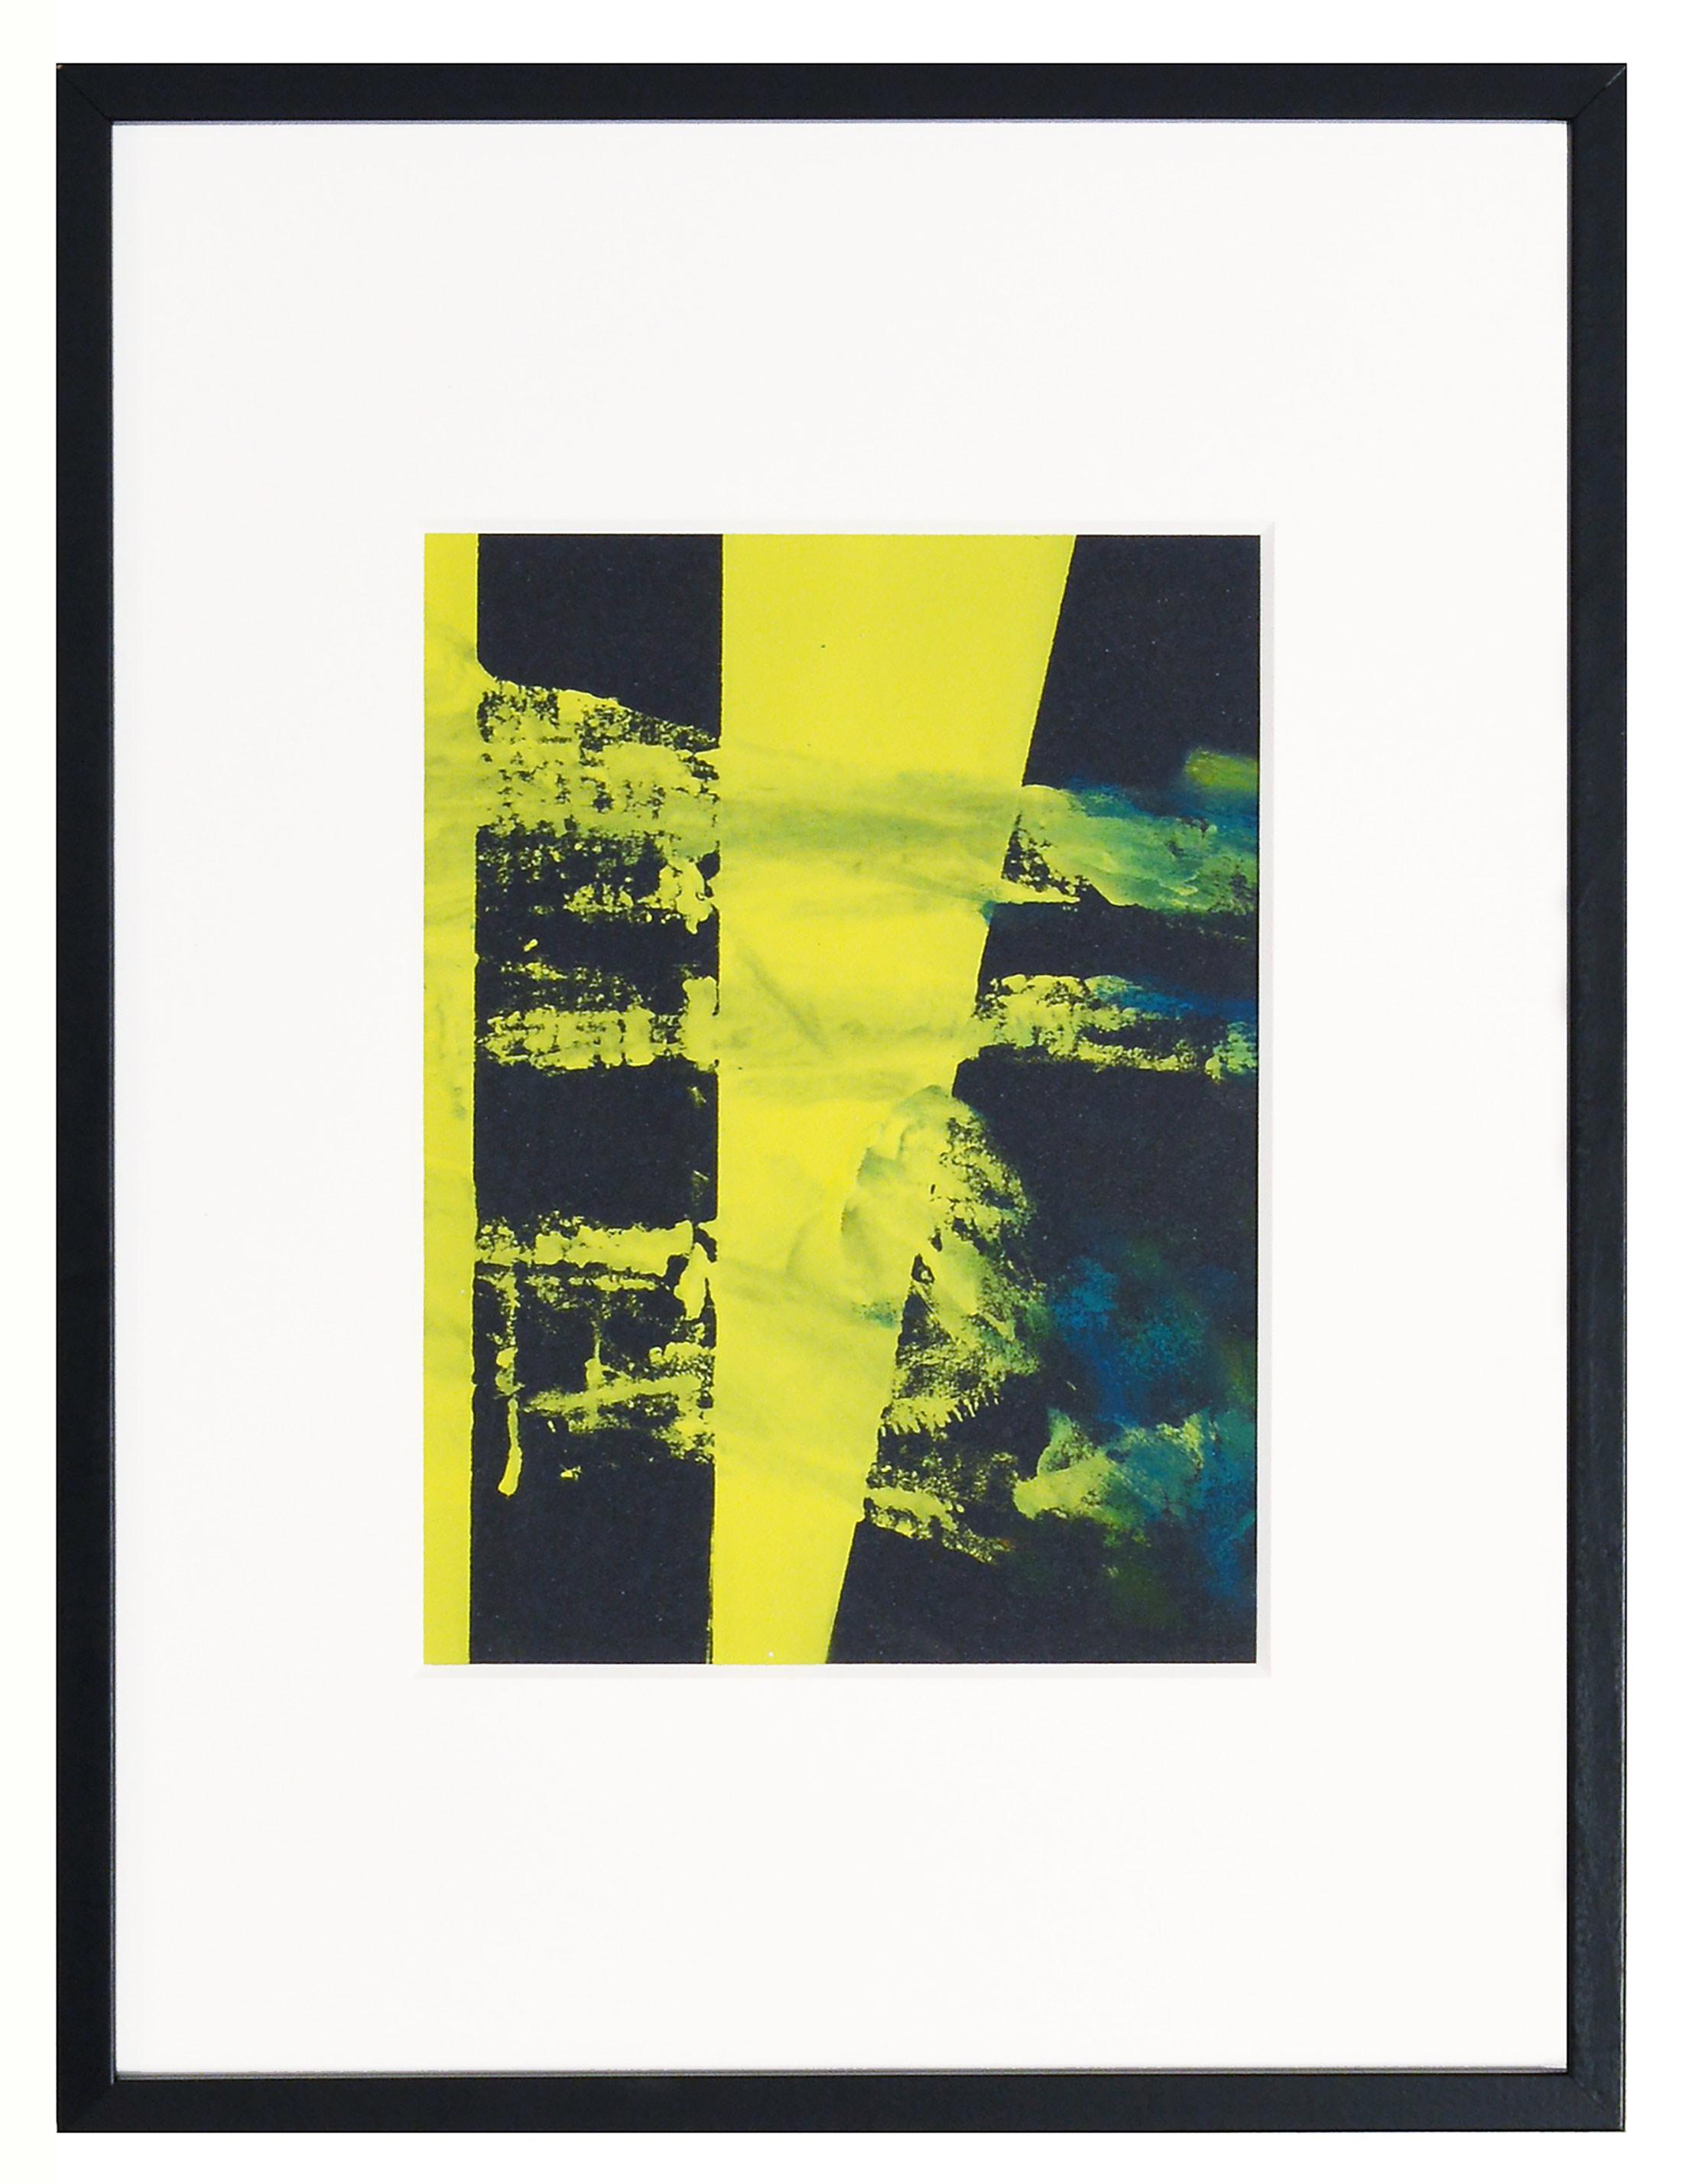 artwork, yellow, black, emanuel ehgartner, spotlight